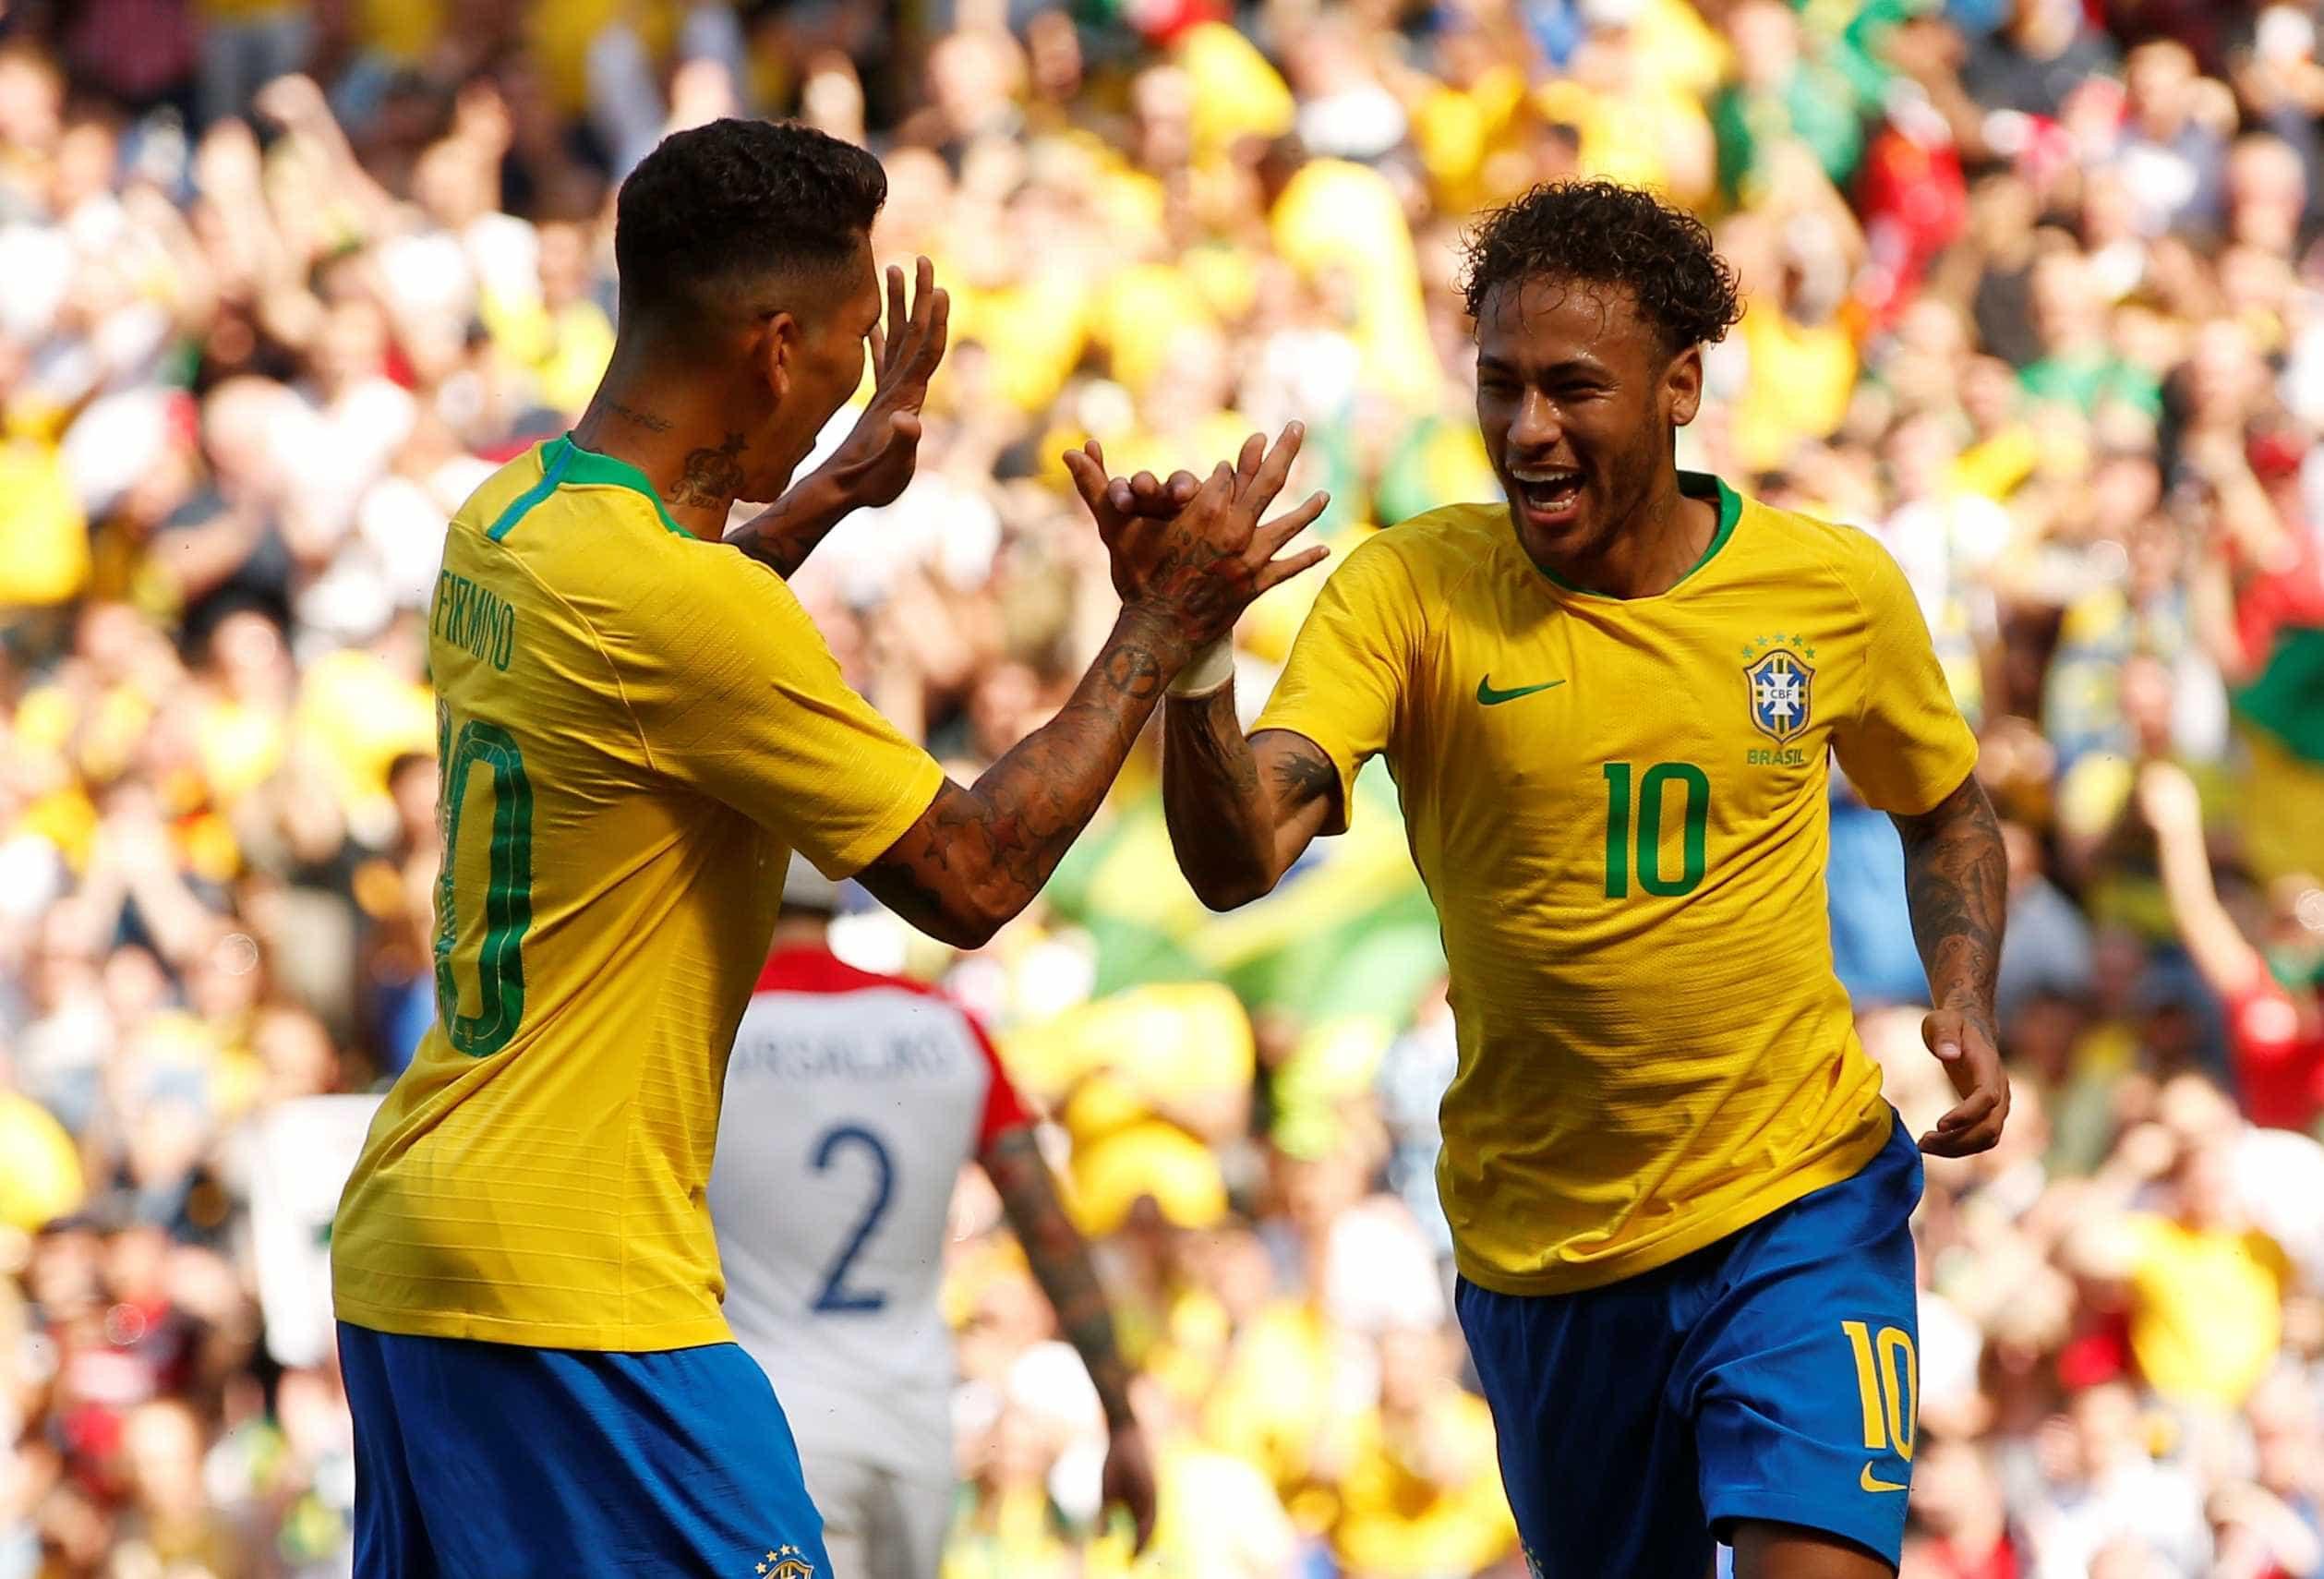 Neymar volta aos gramados, marca golaço e Brasil vence a Croácia